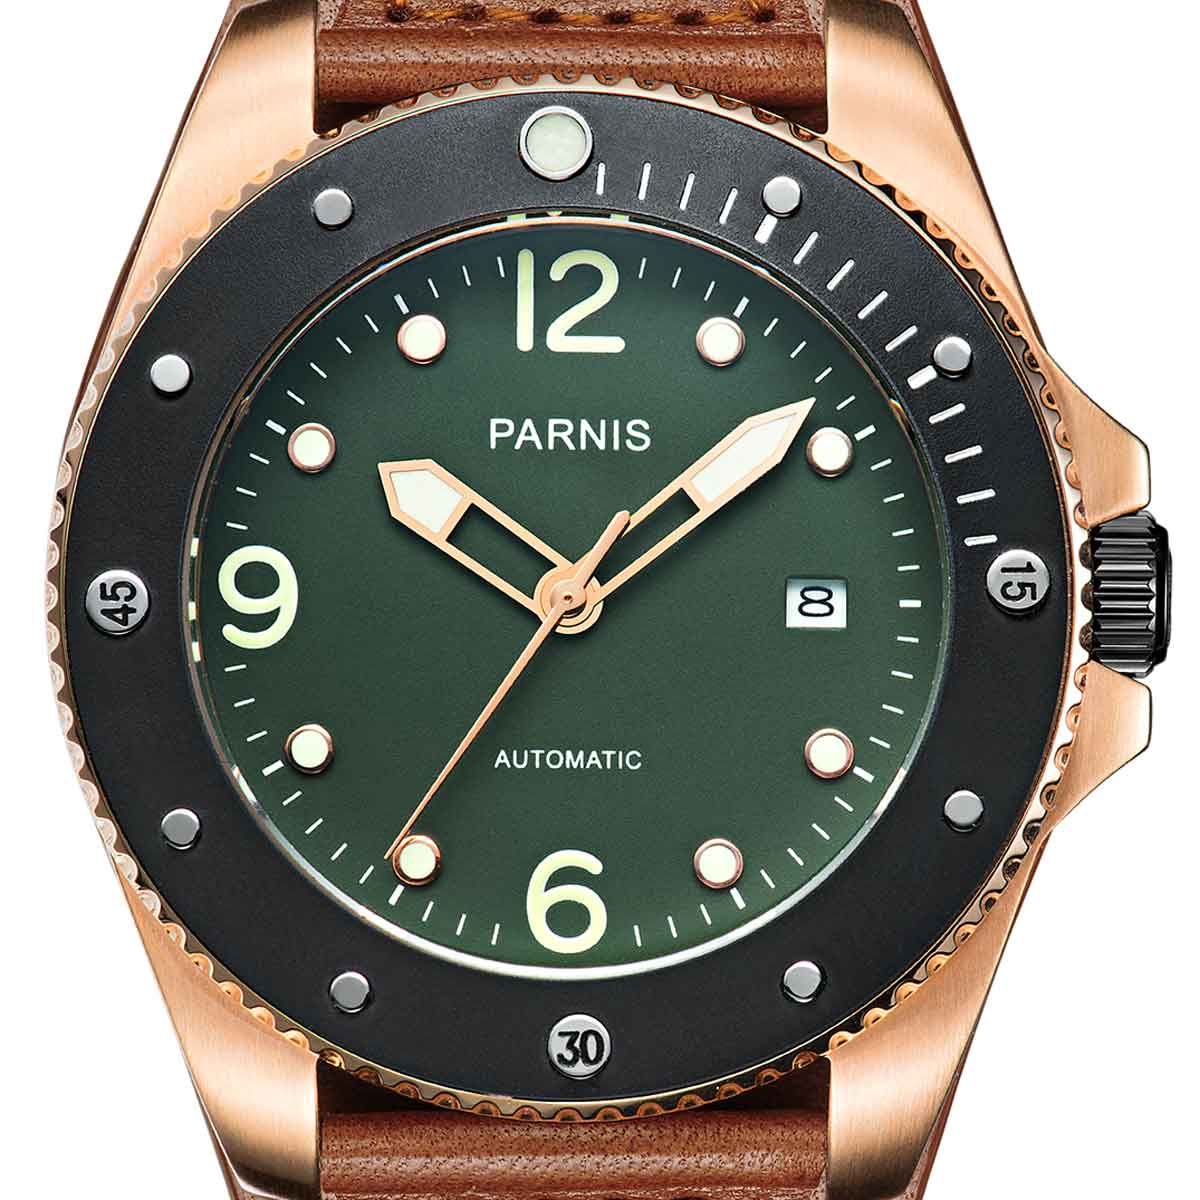 【NEW】PARNIS パーニス 自動巻き 腕時計 [PA6029-S3AL-RGBR] 並行輸入品 純正ケース メーカー保証12ヶ月